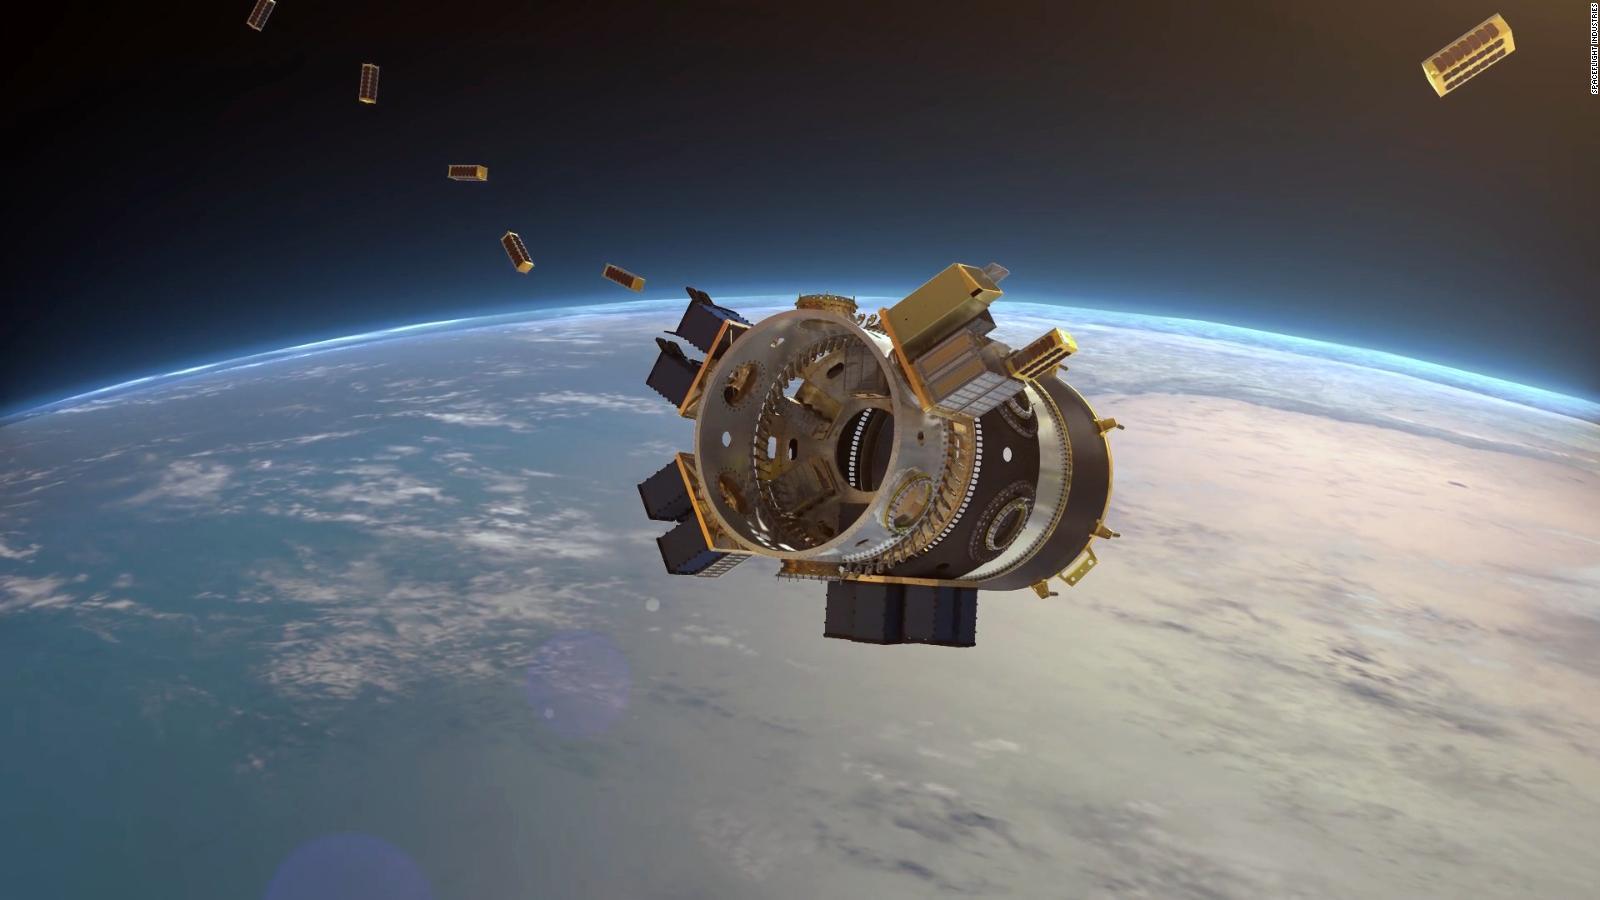 Así lanzó SpaceX 64 satélites en un solo cohete espacial